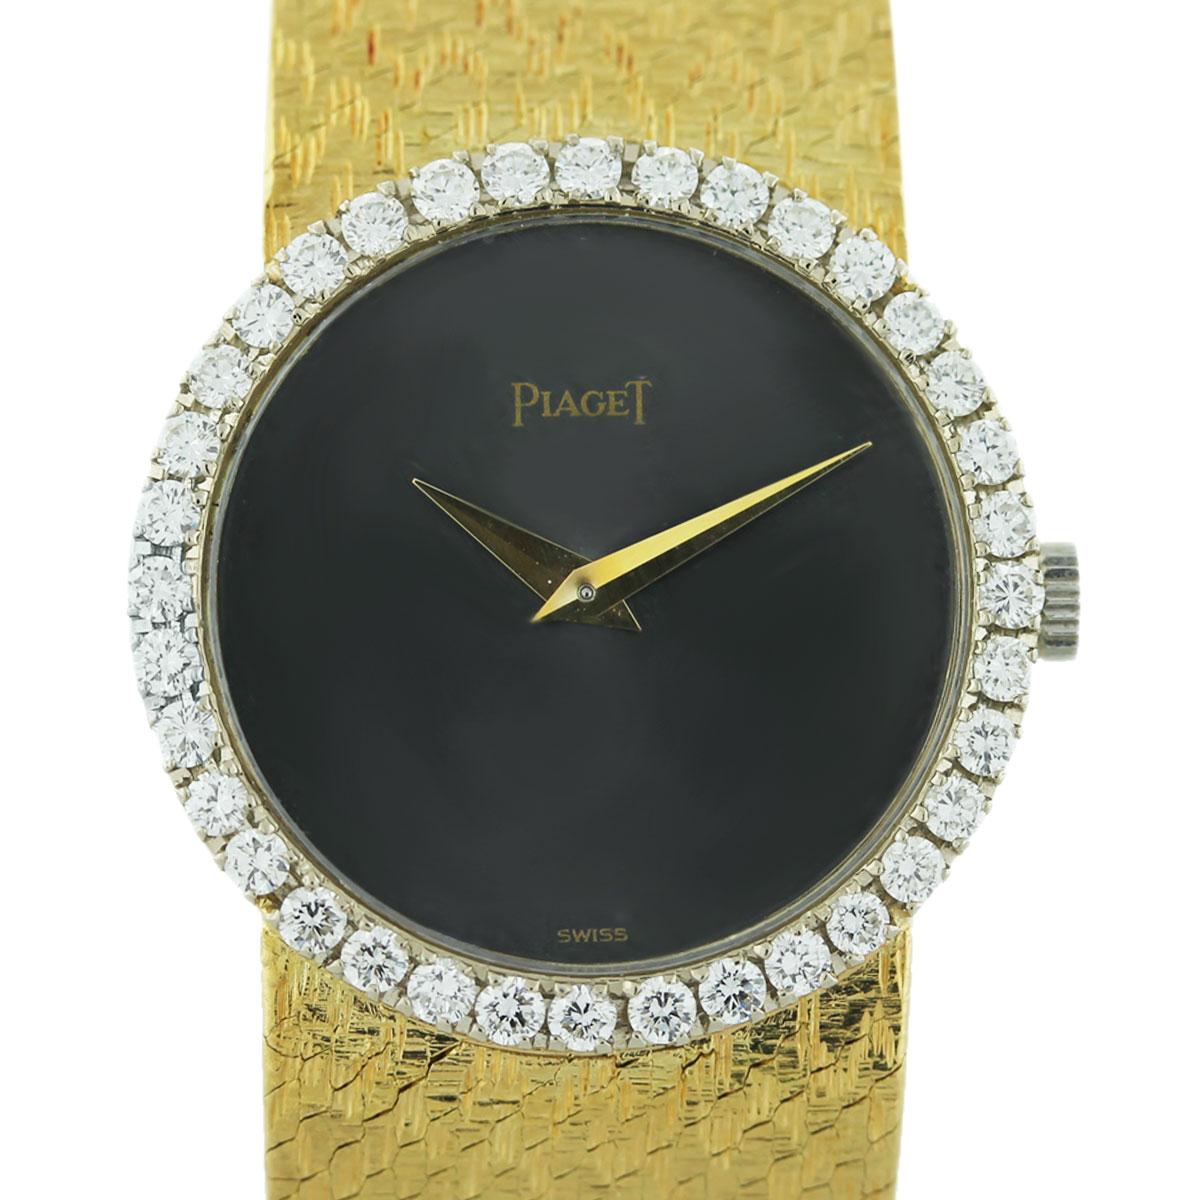 Piaget Vintage Diamond 18k Yellow Gold Ladies Watch Boca Raton